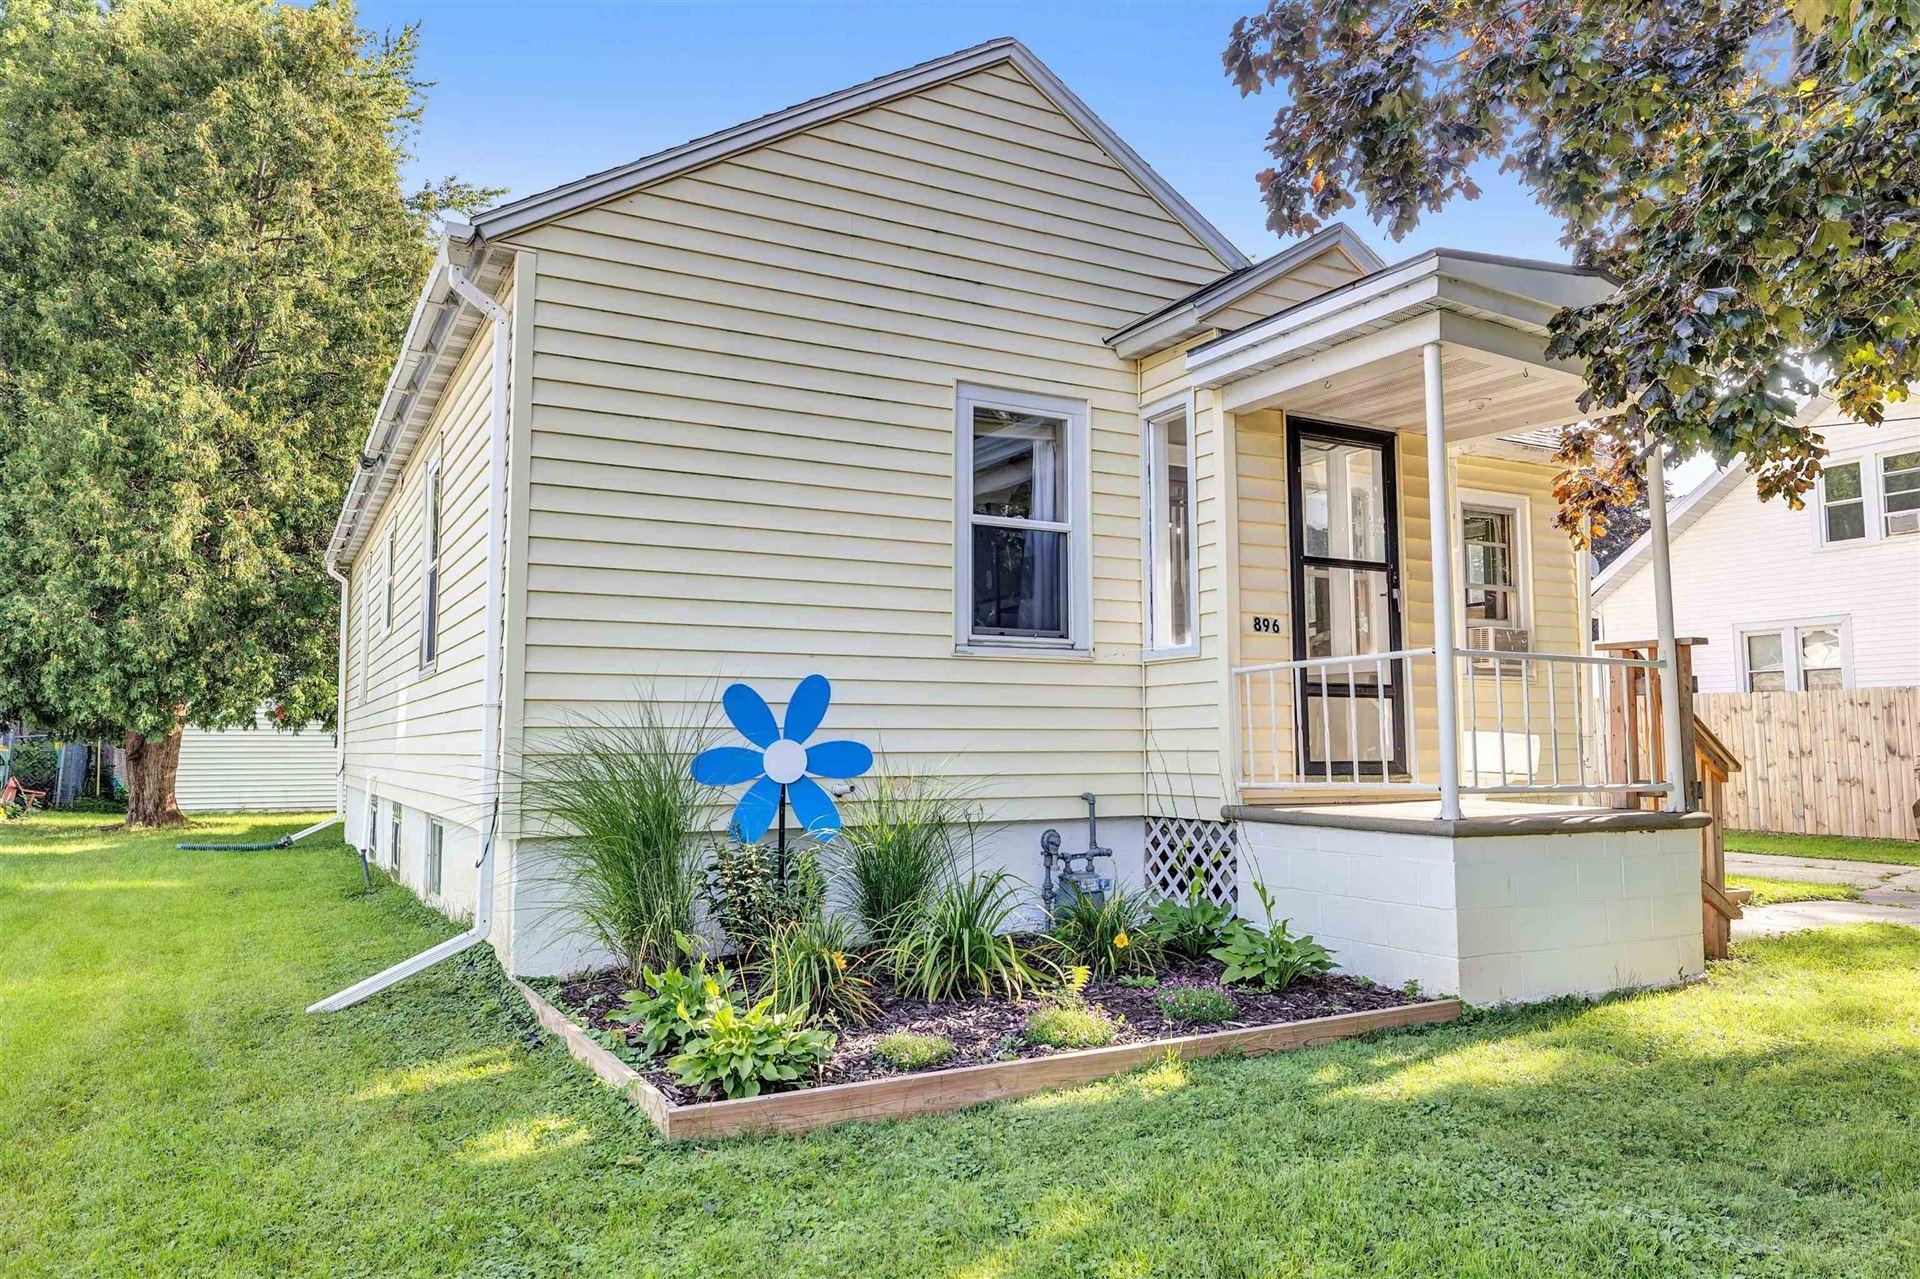 896 9TH Street, Green Bay, WI 54304 - MLS#: 50247121